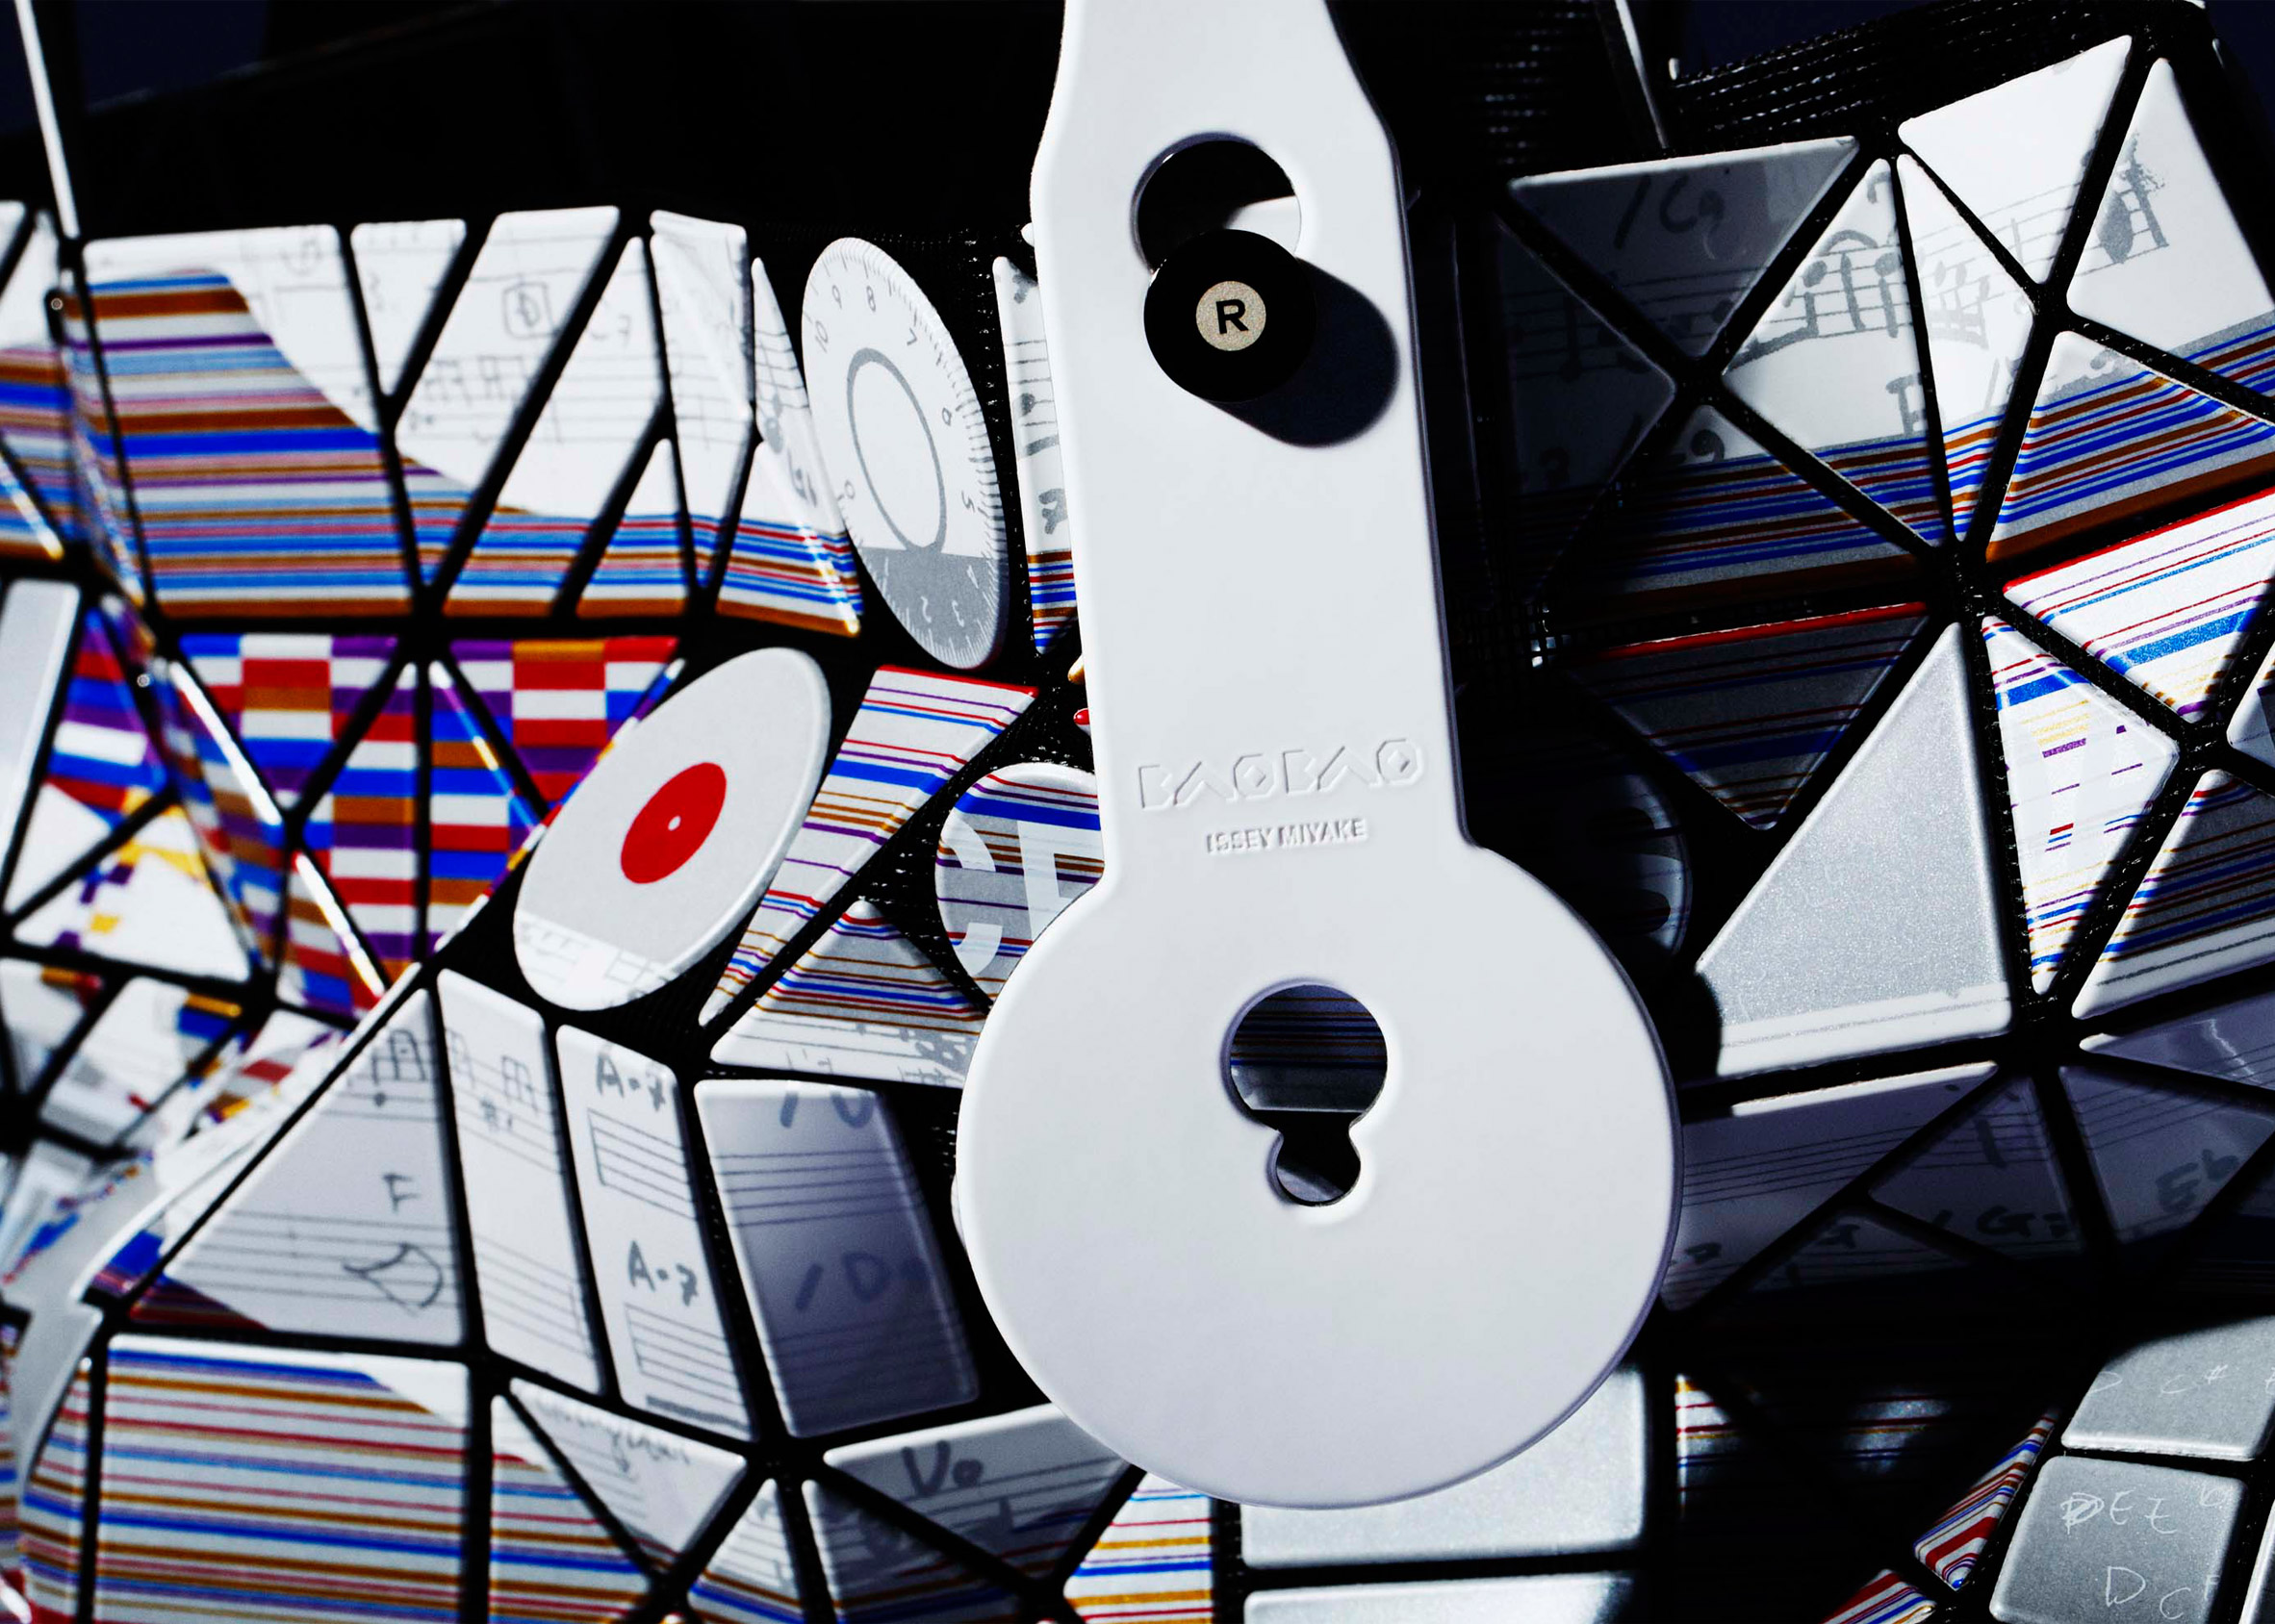 Chord by Issey Miyake